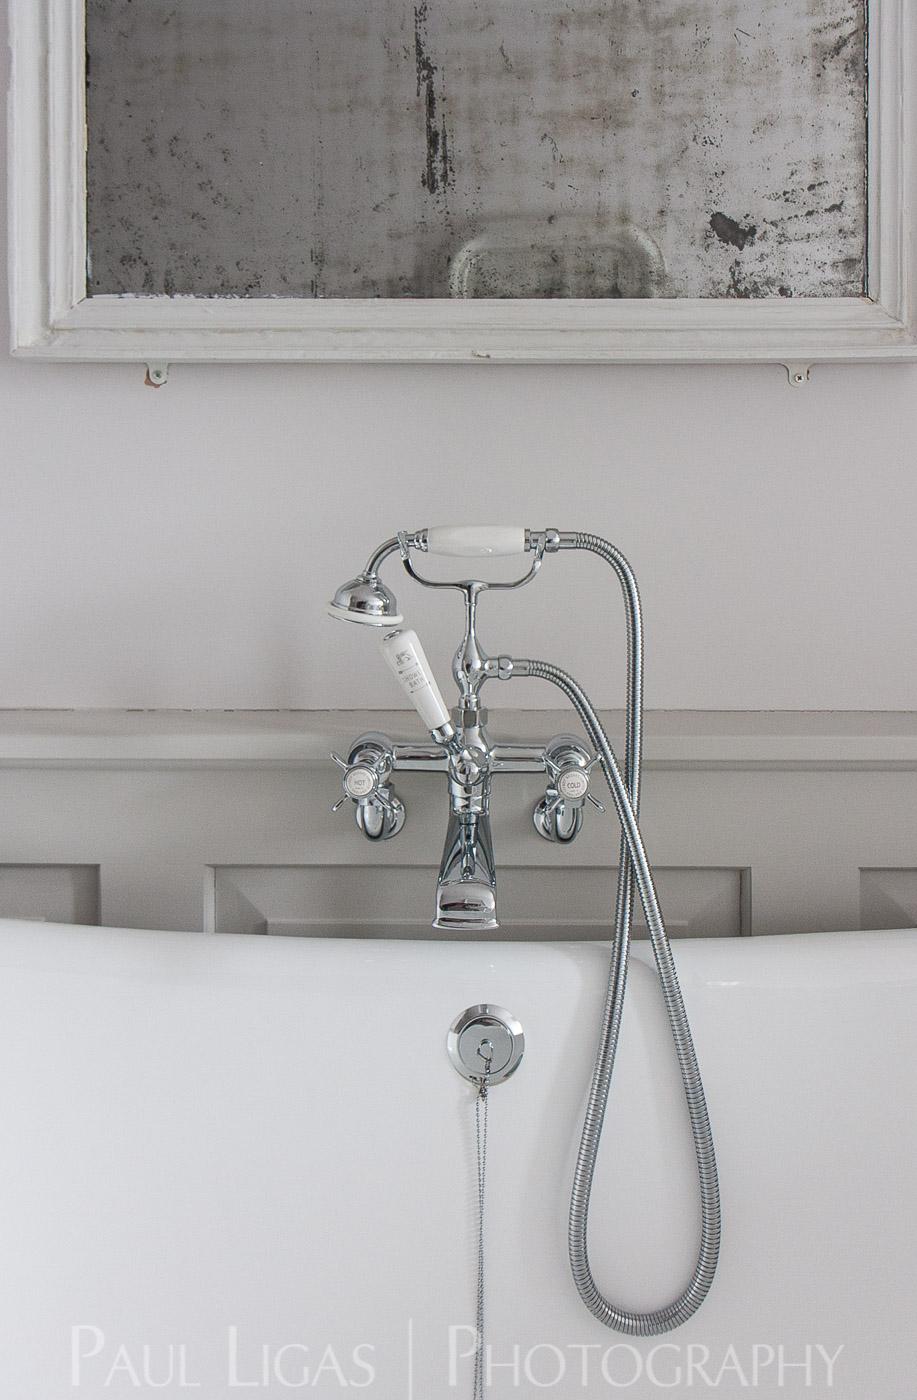 Yeoman SW, plumbing heating interior lifestyle architecture photographer herefordshire photography 3595